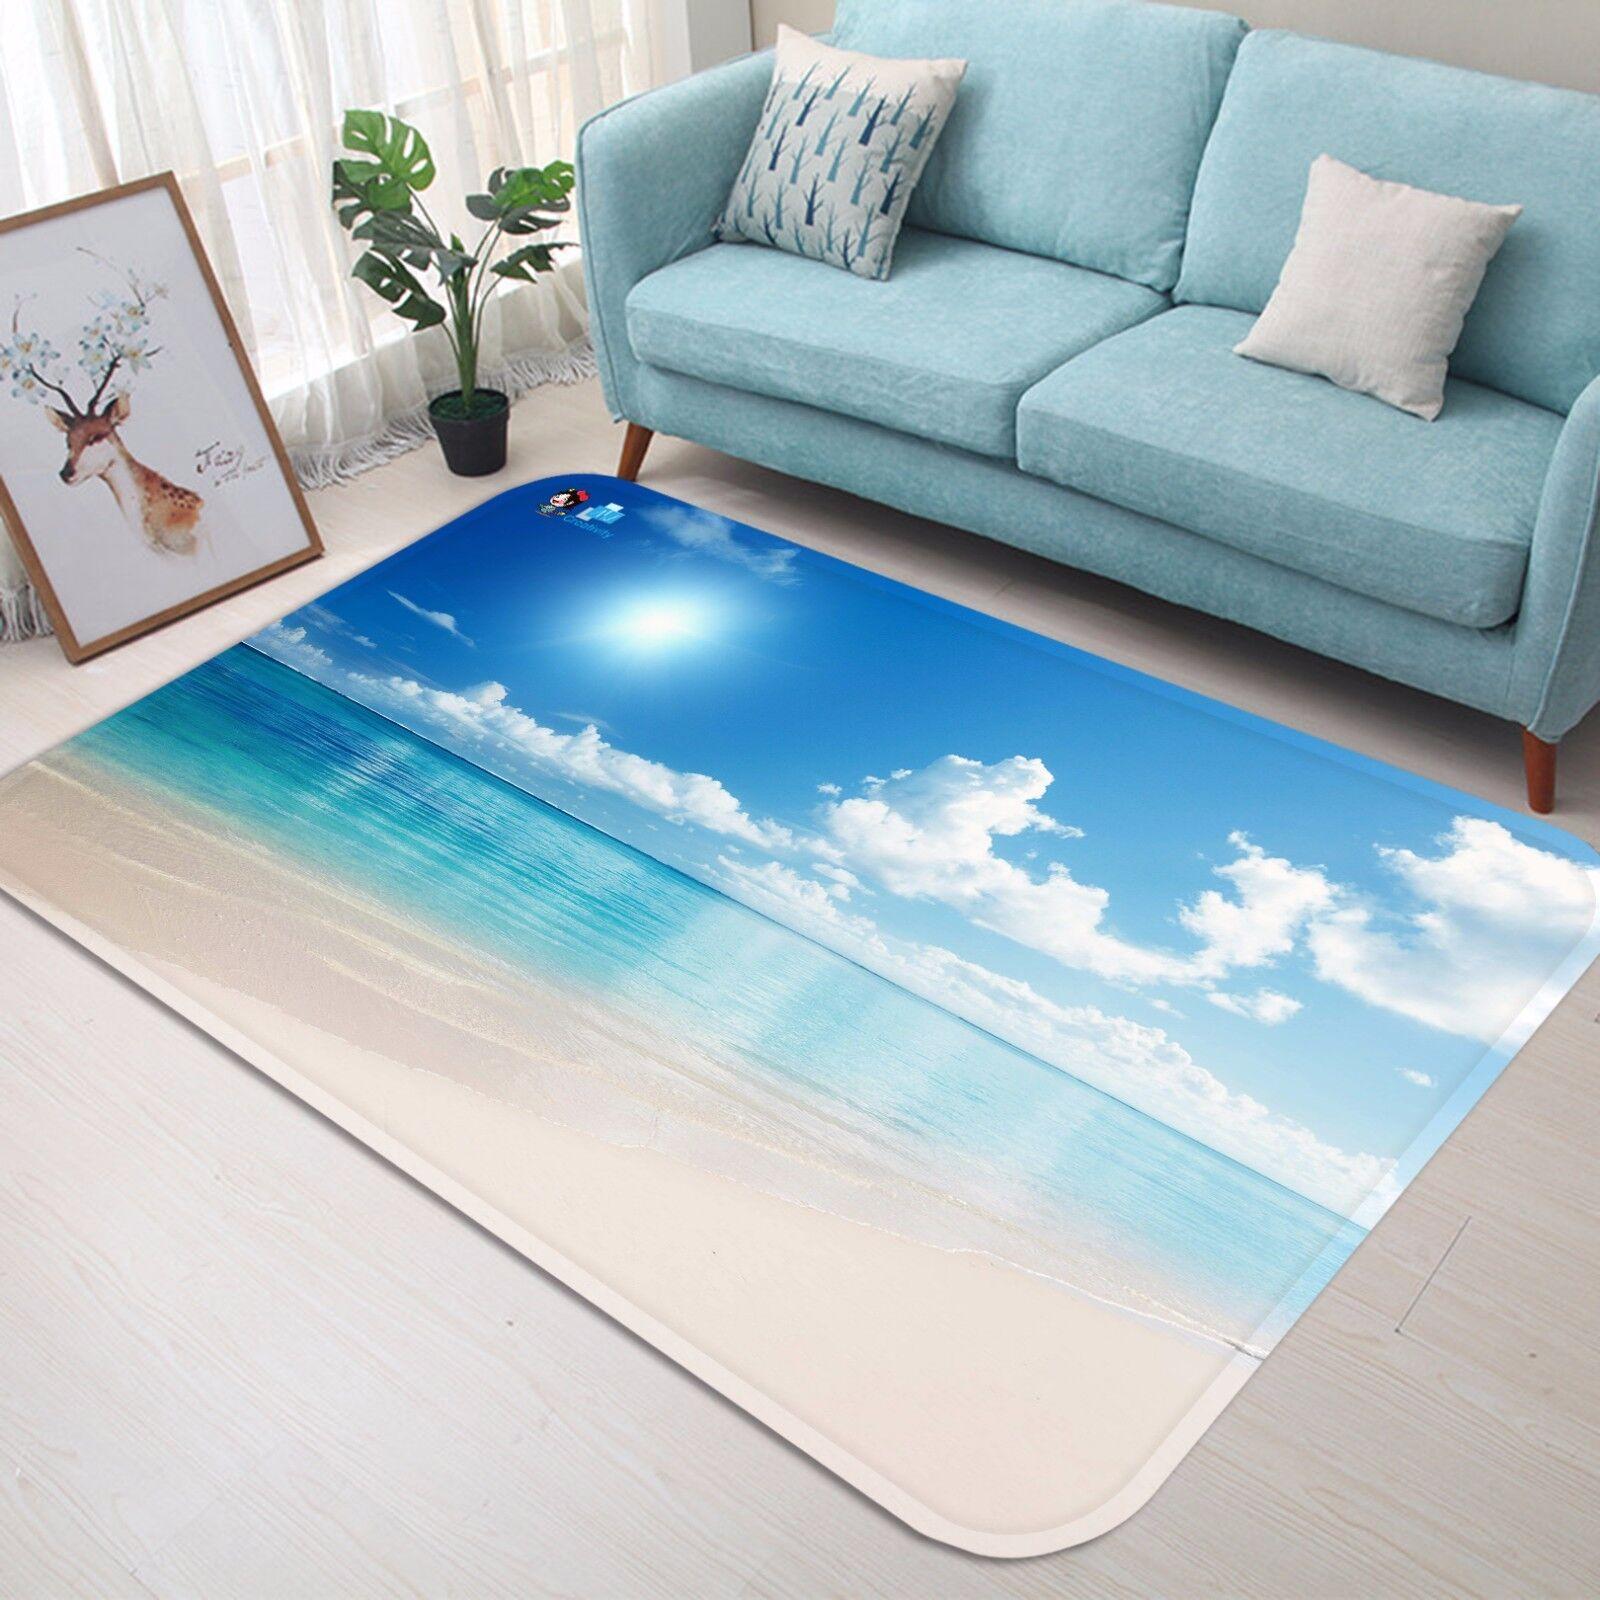 3D Ozean 411 Rutschfest Rutschfest Rutschfest Teppich Matte Raum Matte Qualität Elegant Teppich DE 2fb102